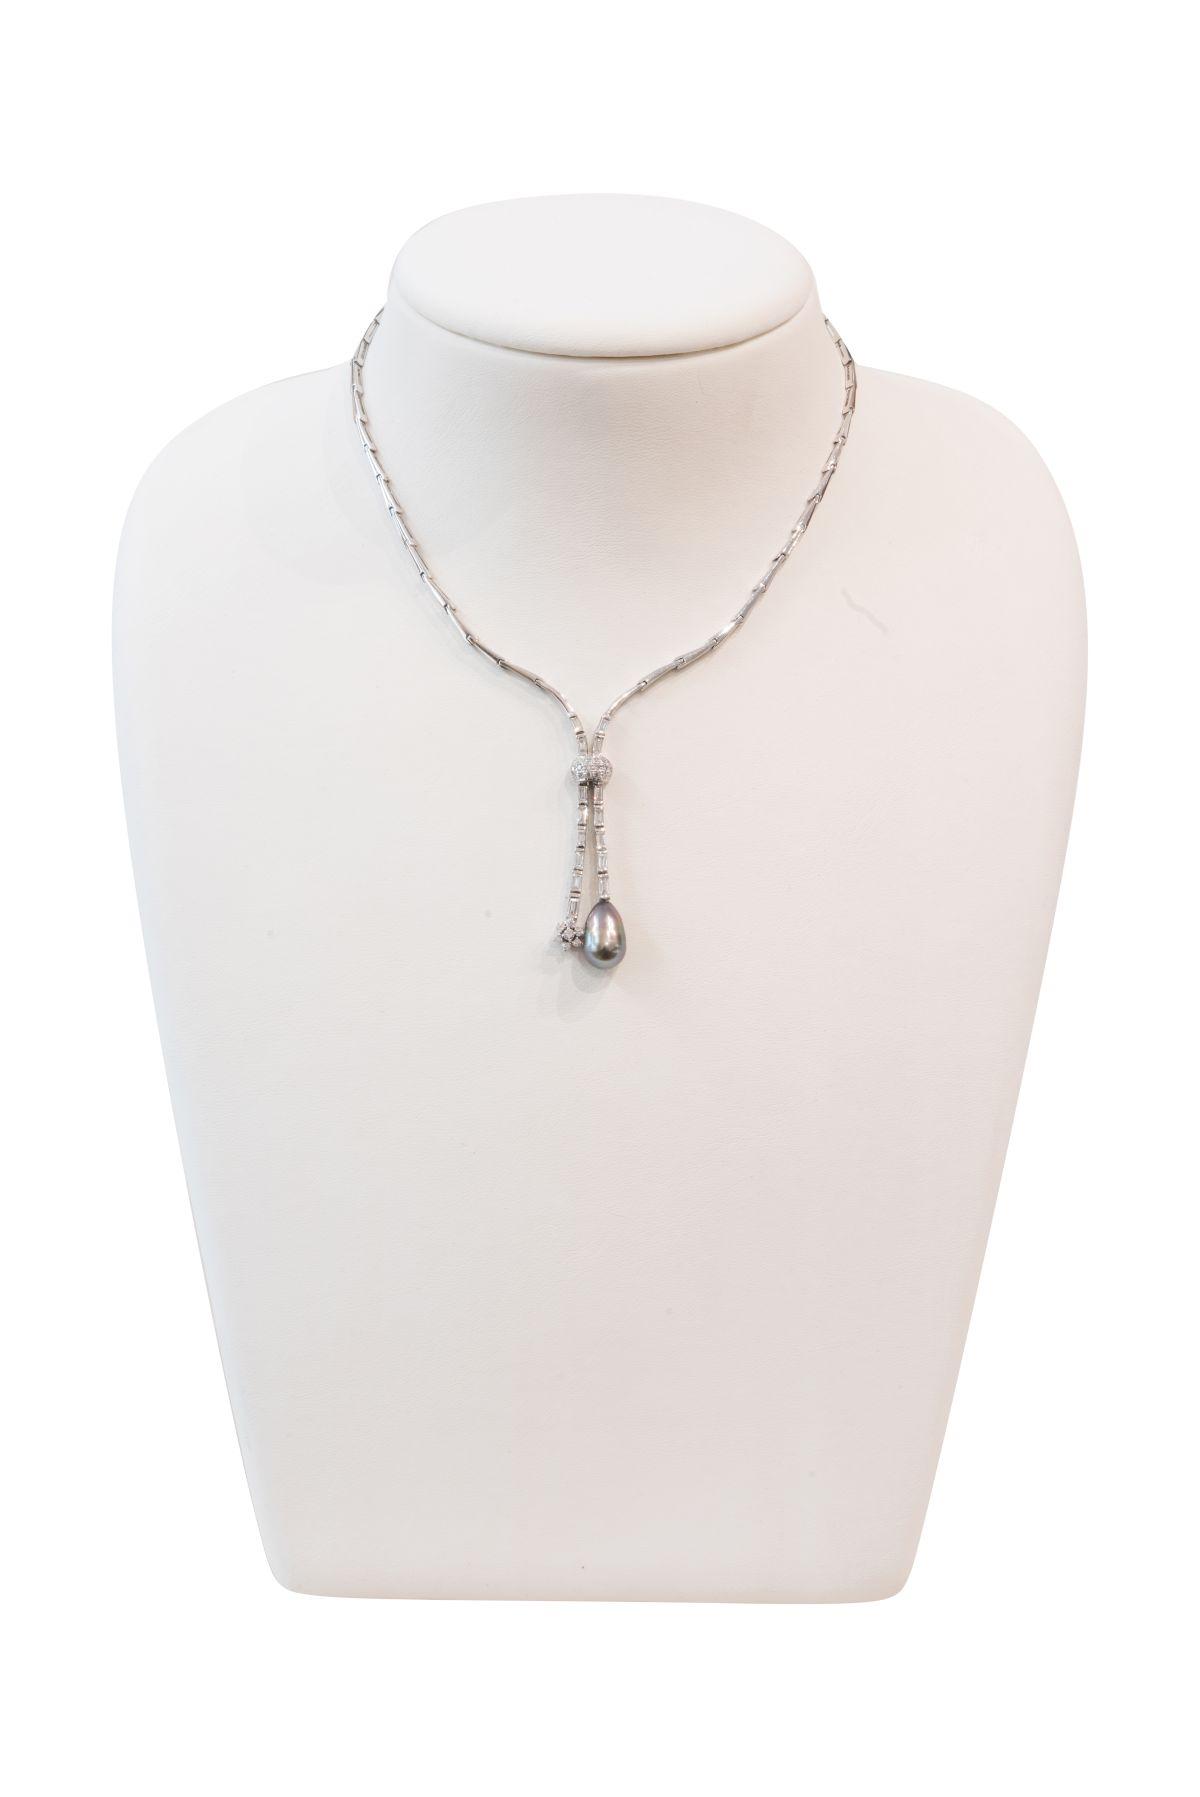 #207 Diamond Necklace | Collier Image